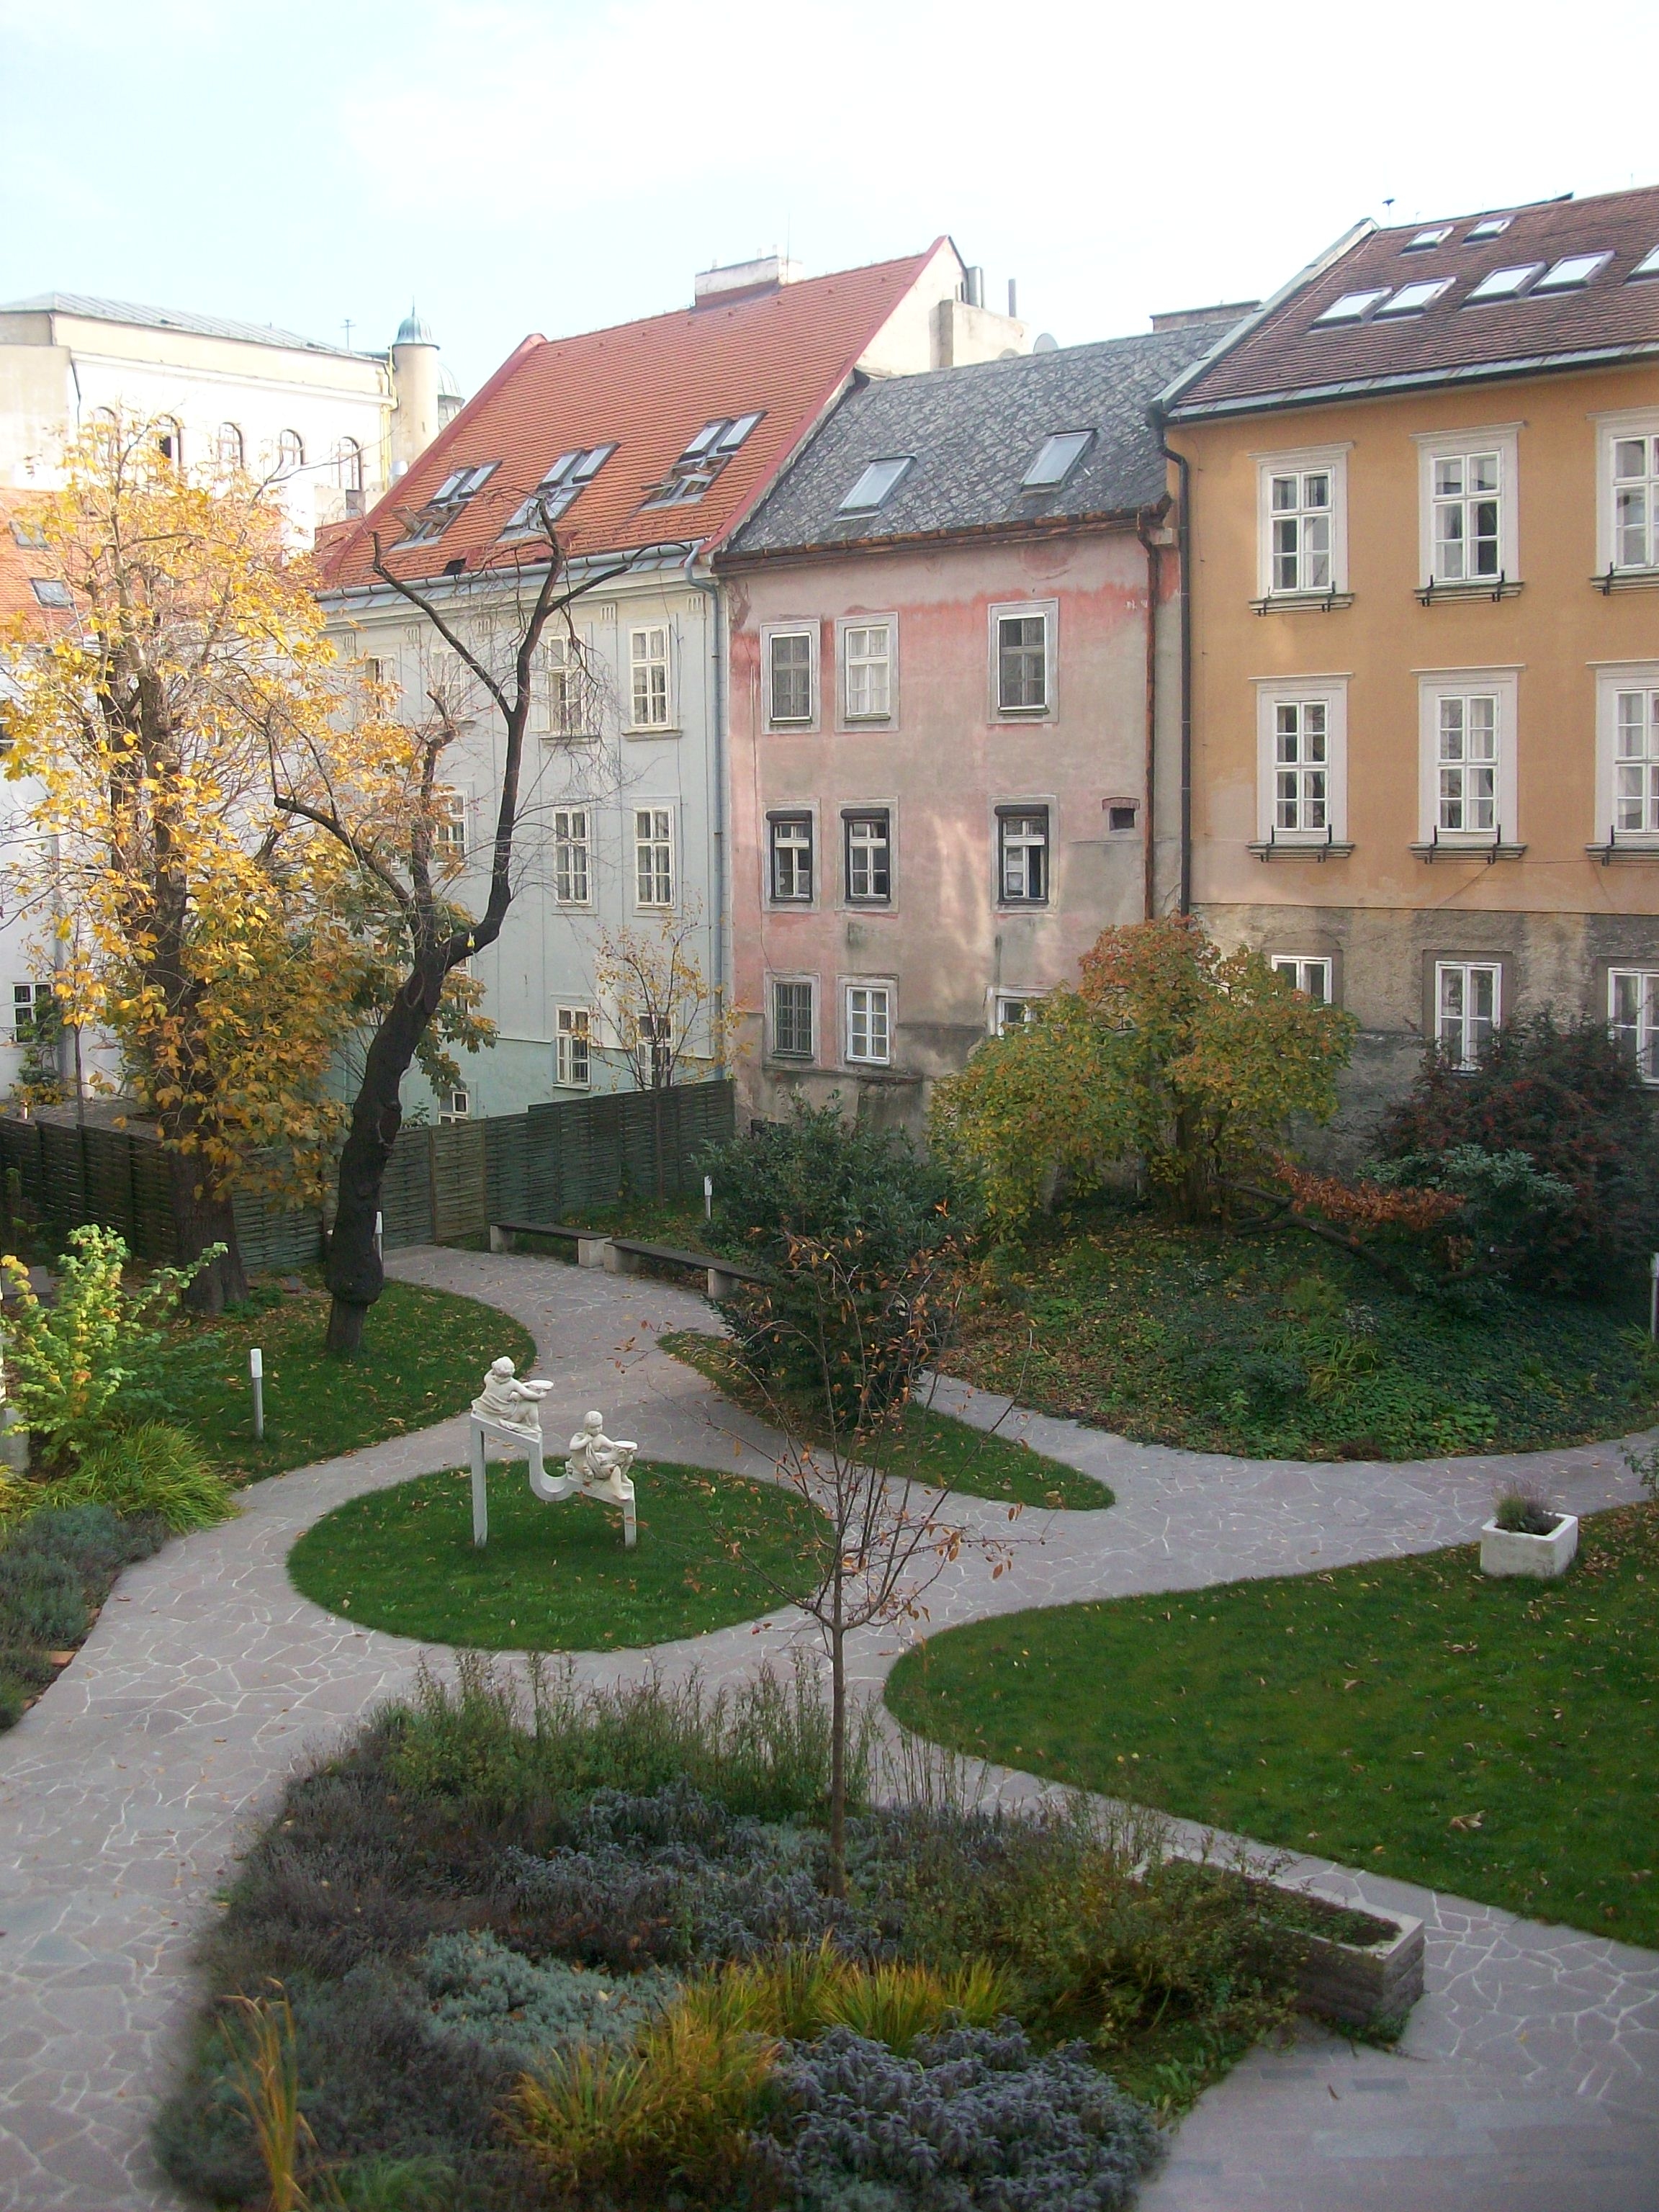 A Courtyard in Bratislava